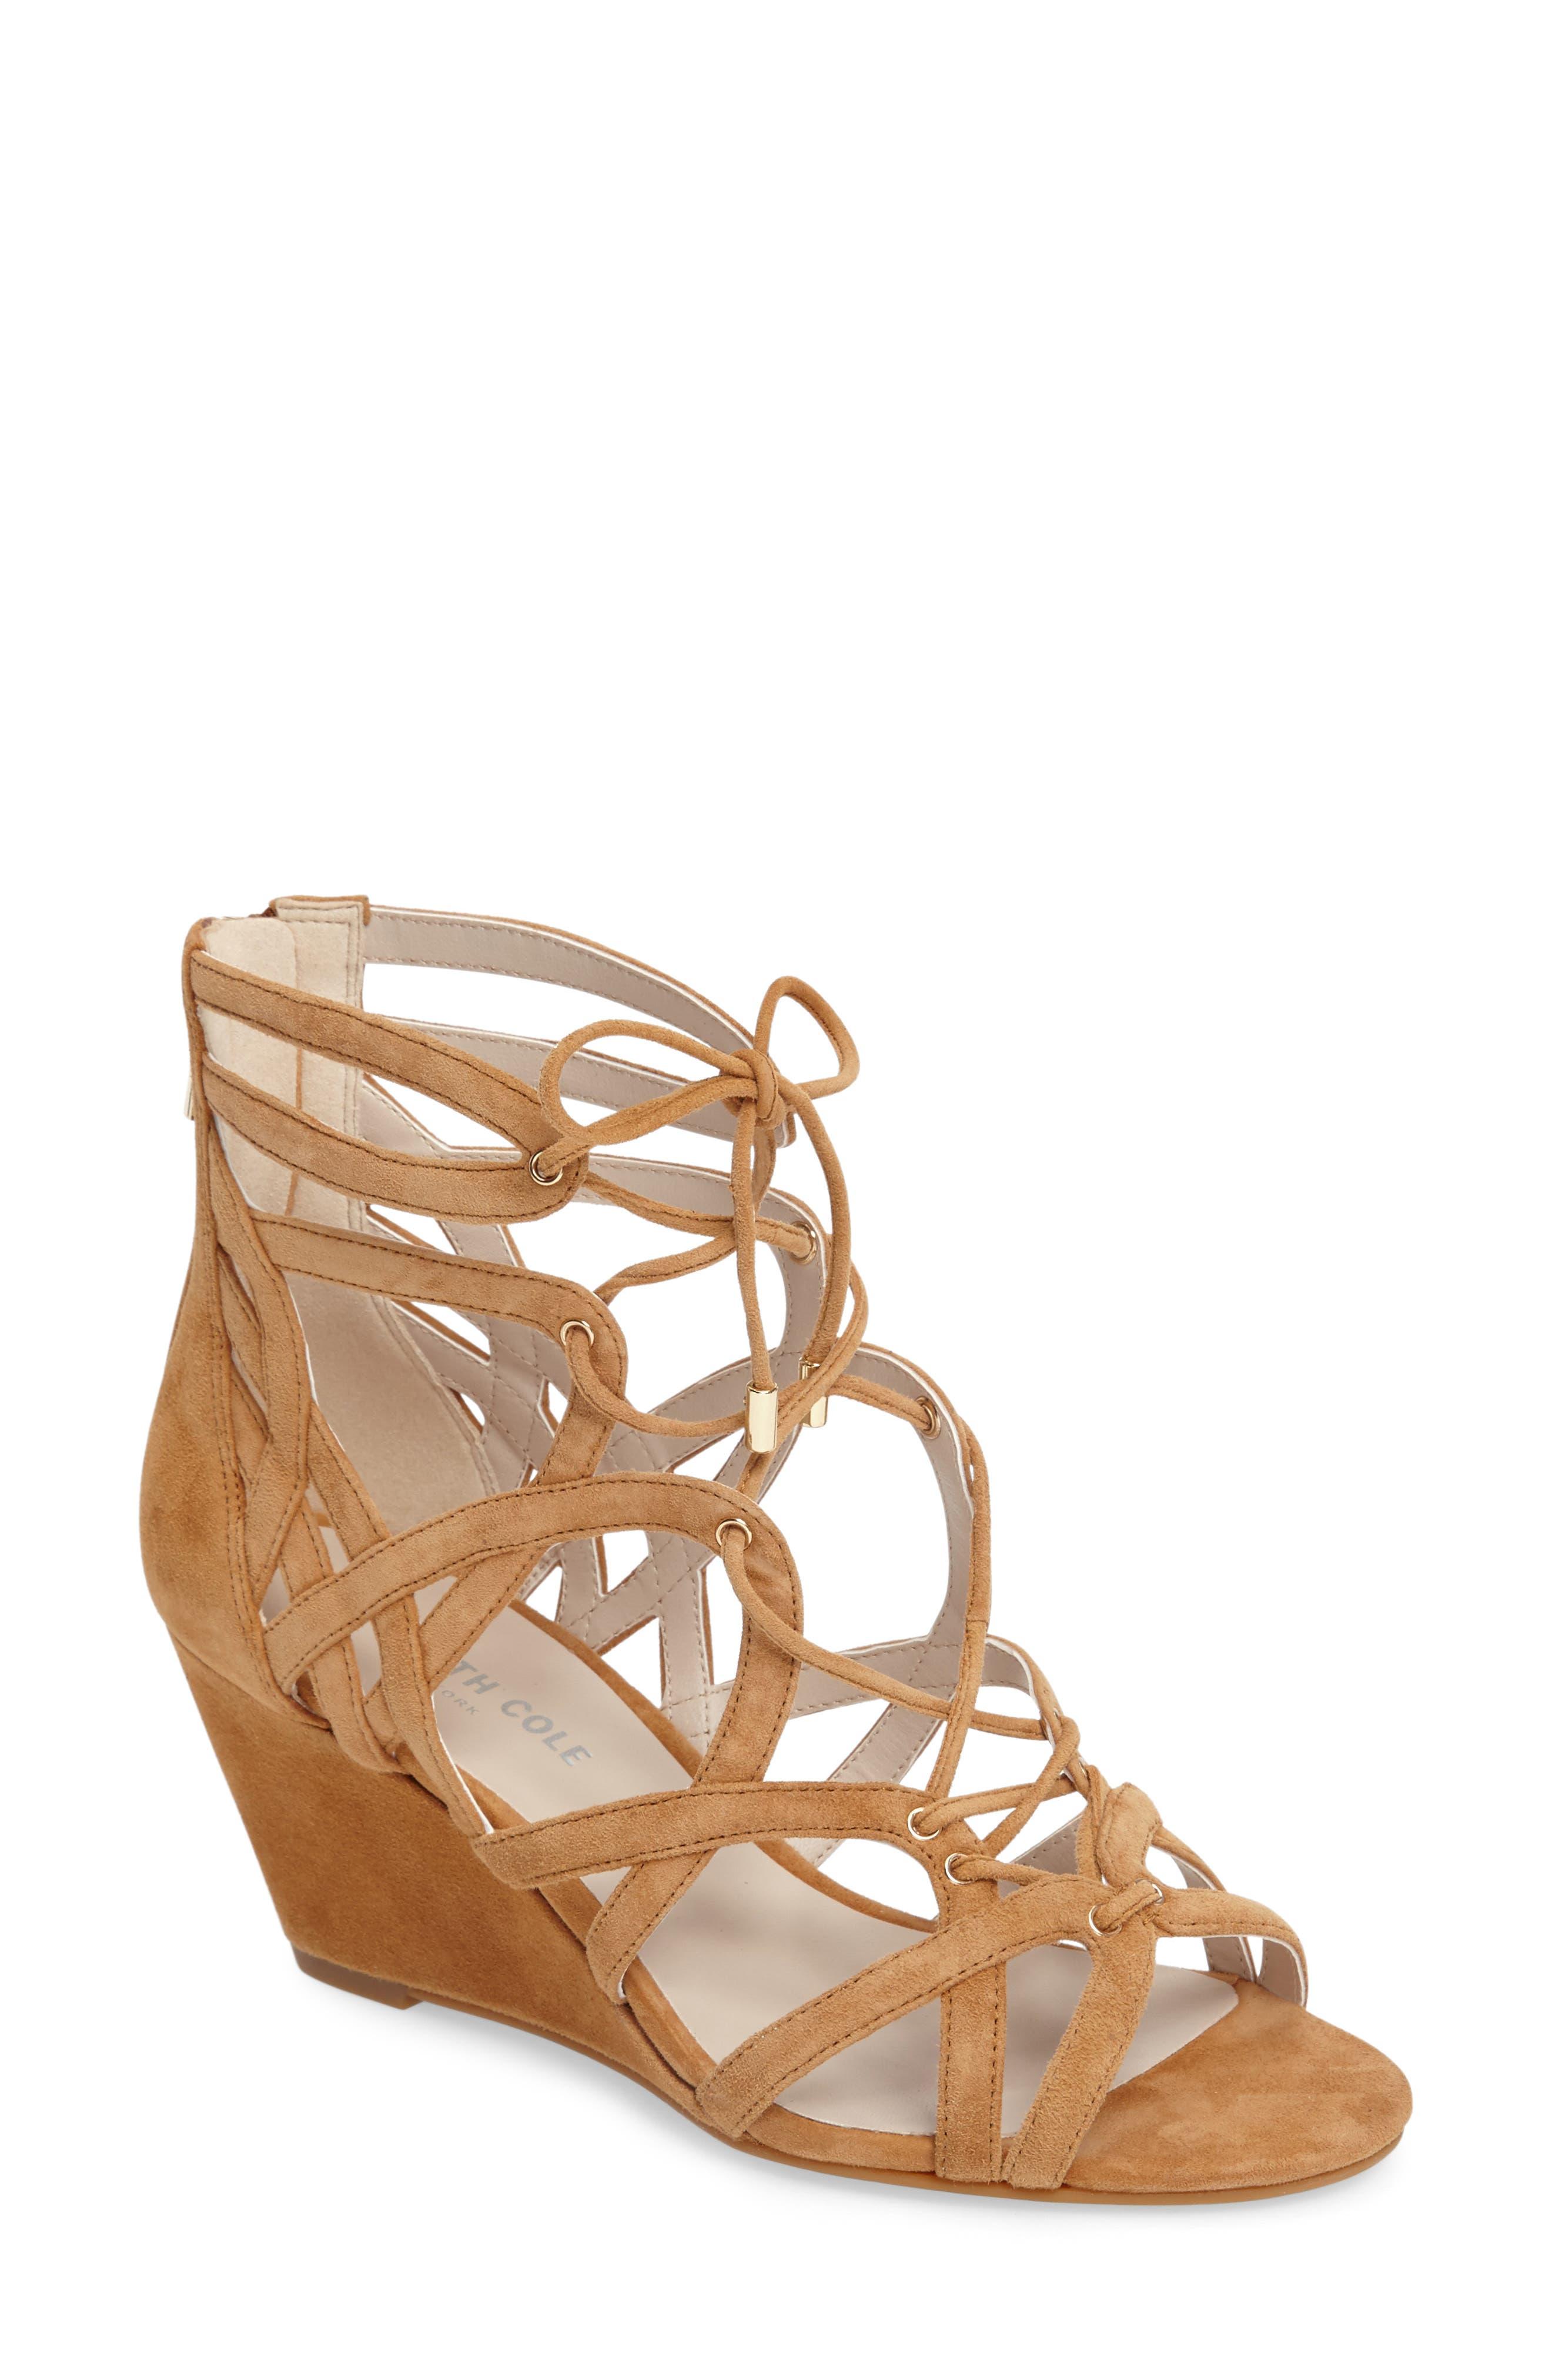 Main Image - Kenneth Cole New York 'Dylan' Wedge Sandal (Women)